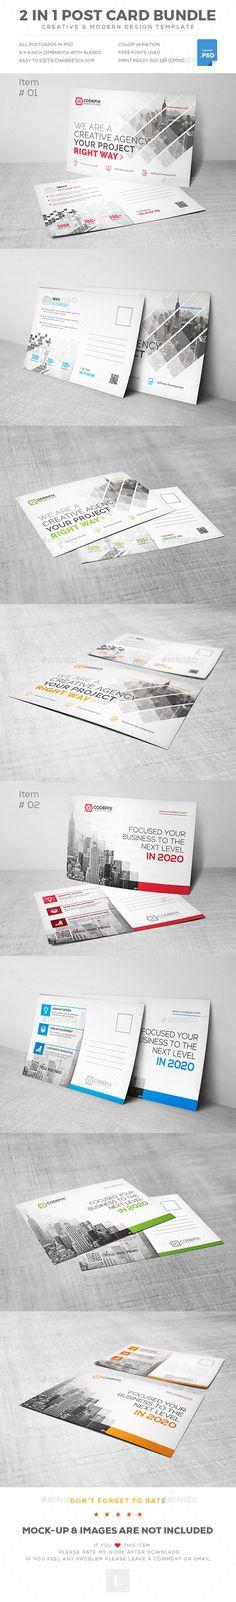 Corporate Business Postcard Template PSD Design Download Http - Postcard template photoshop